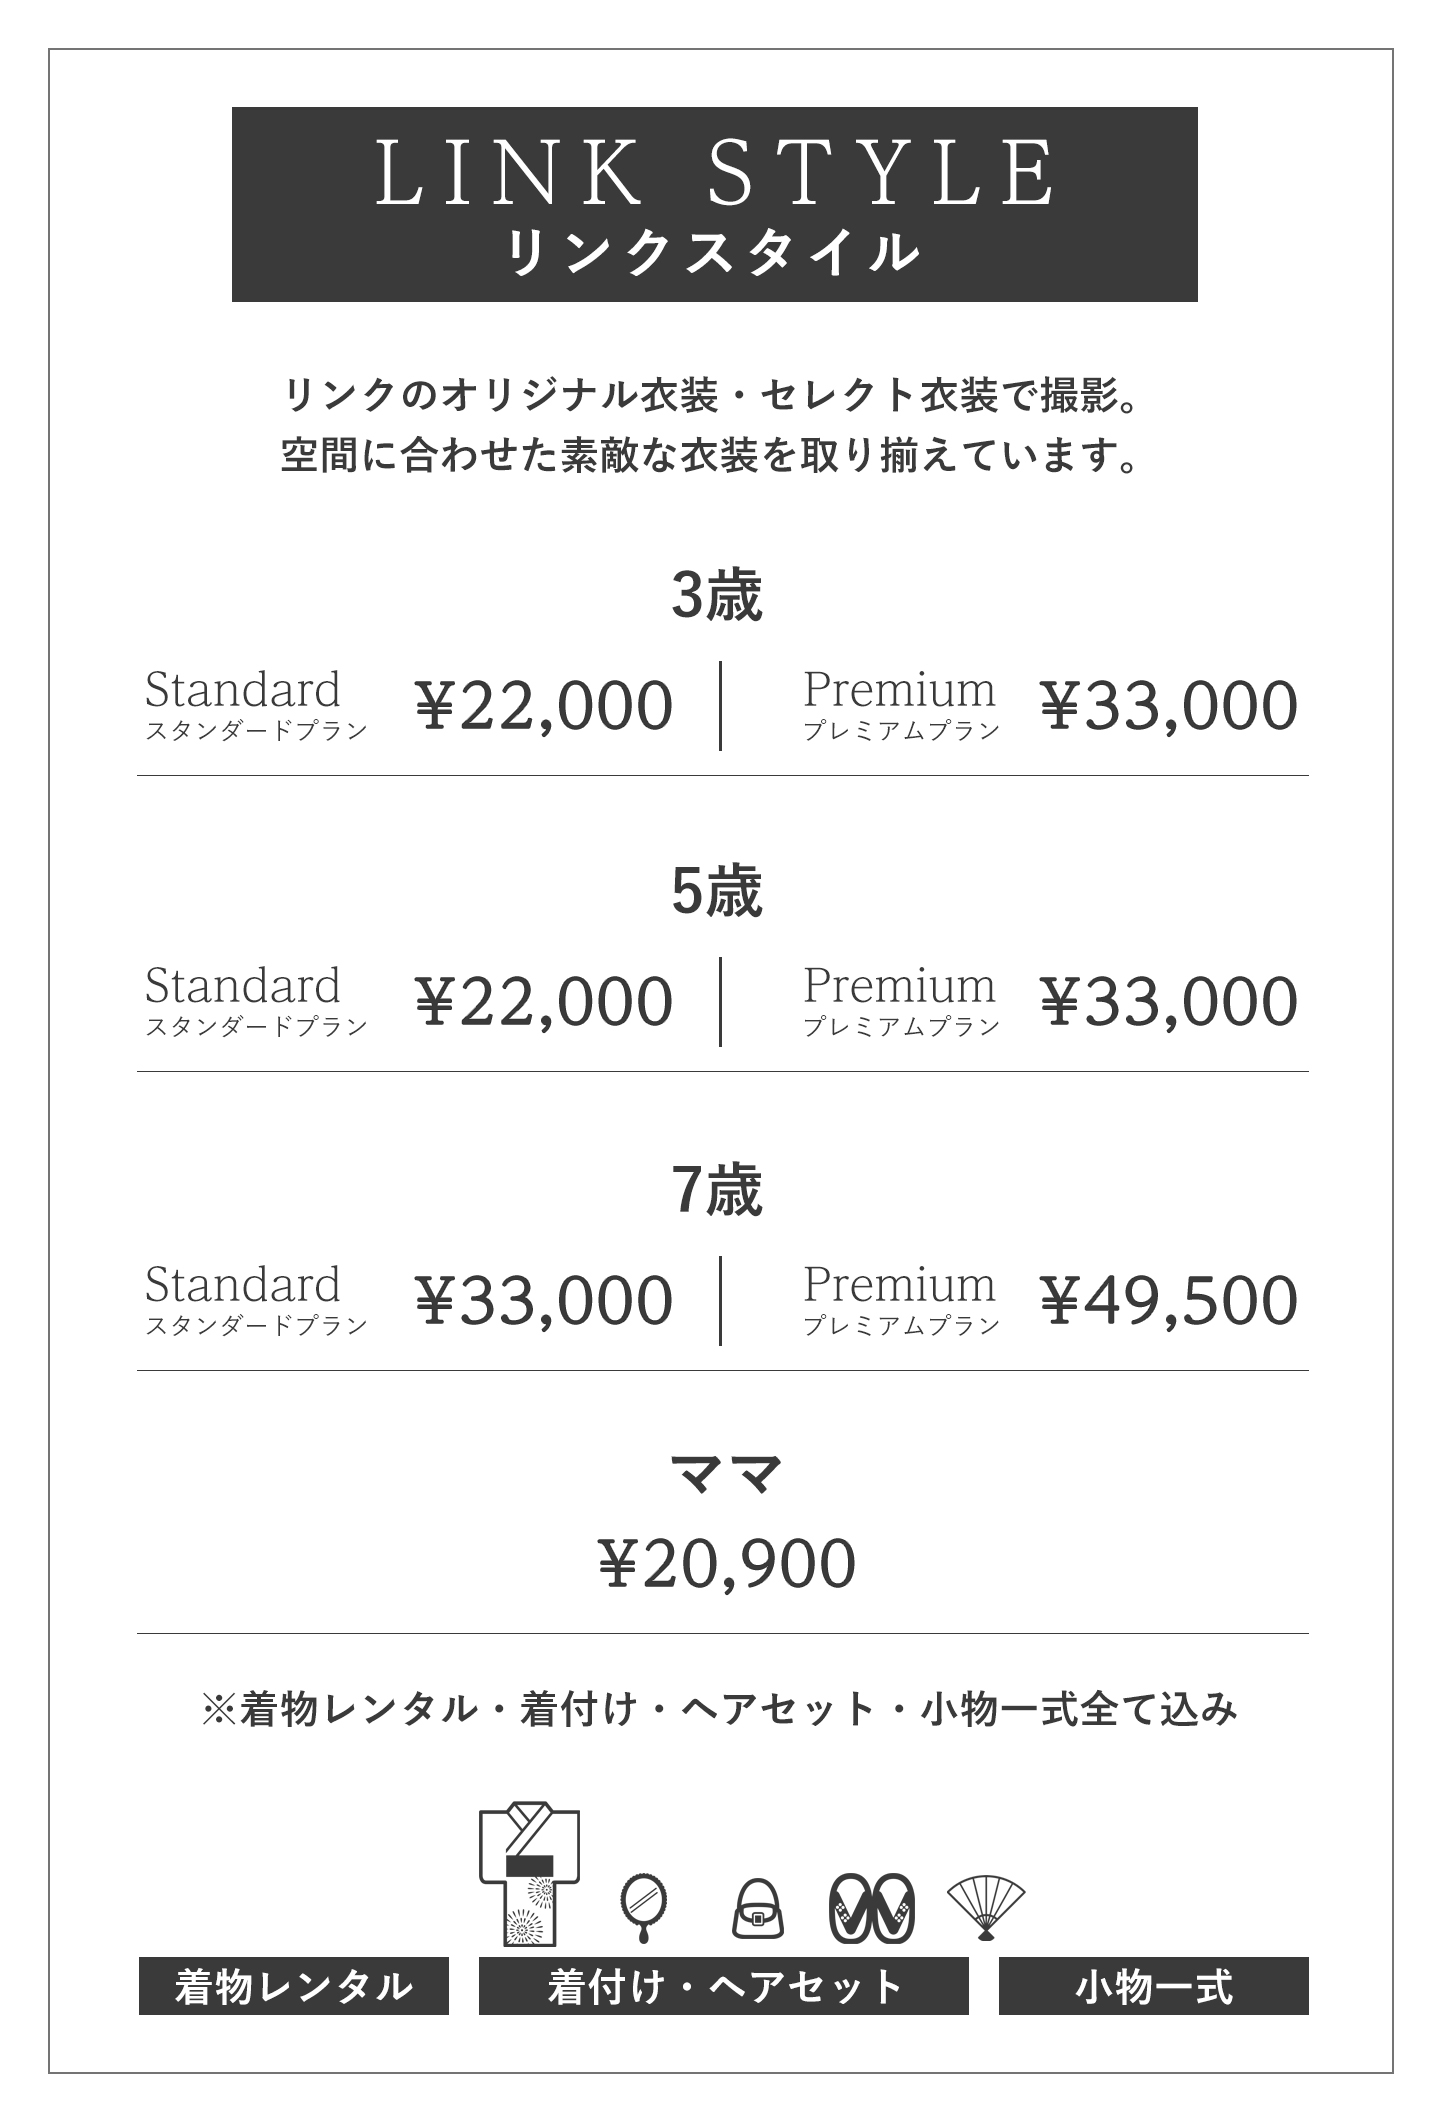 LINKSTYLE価格